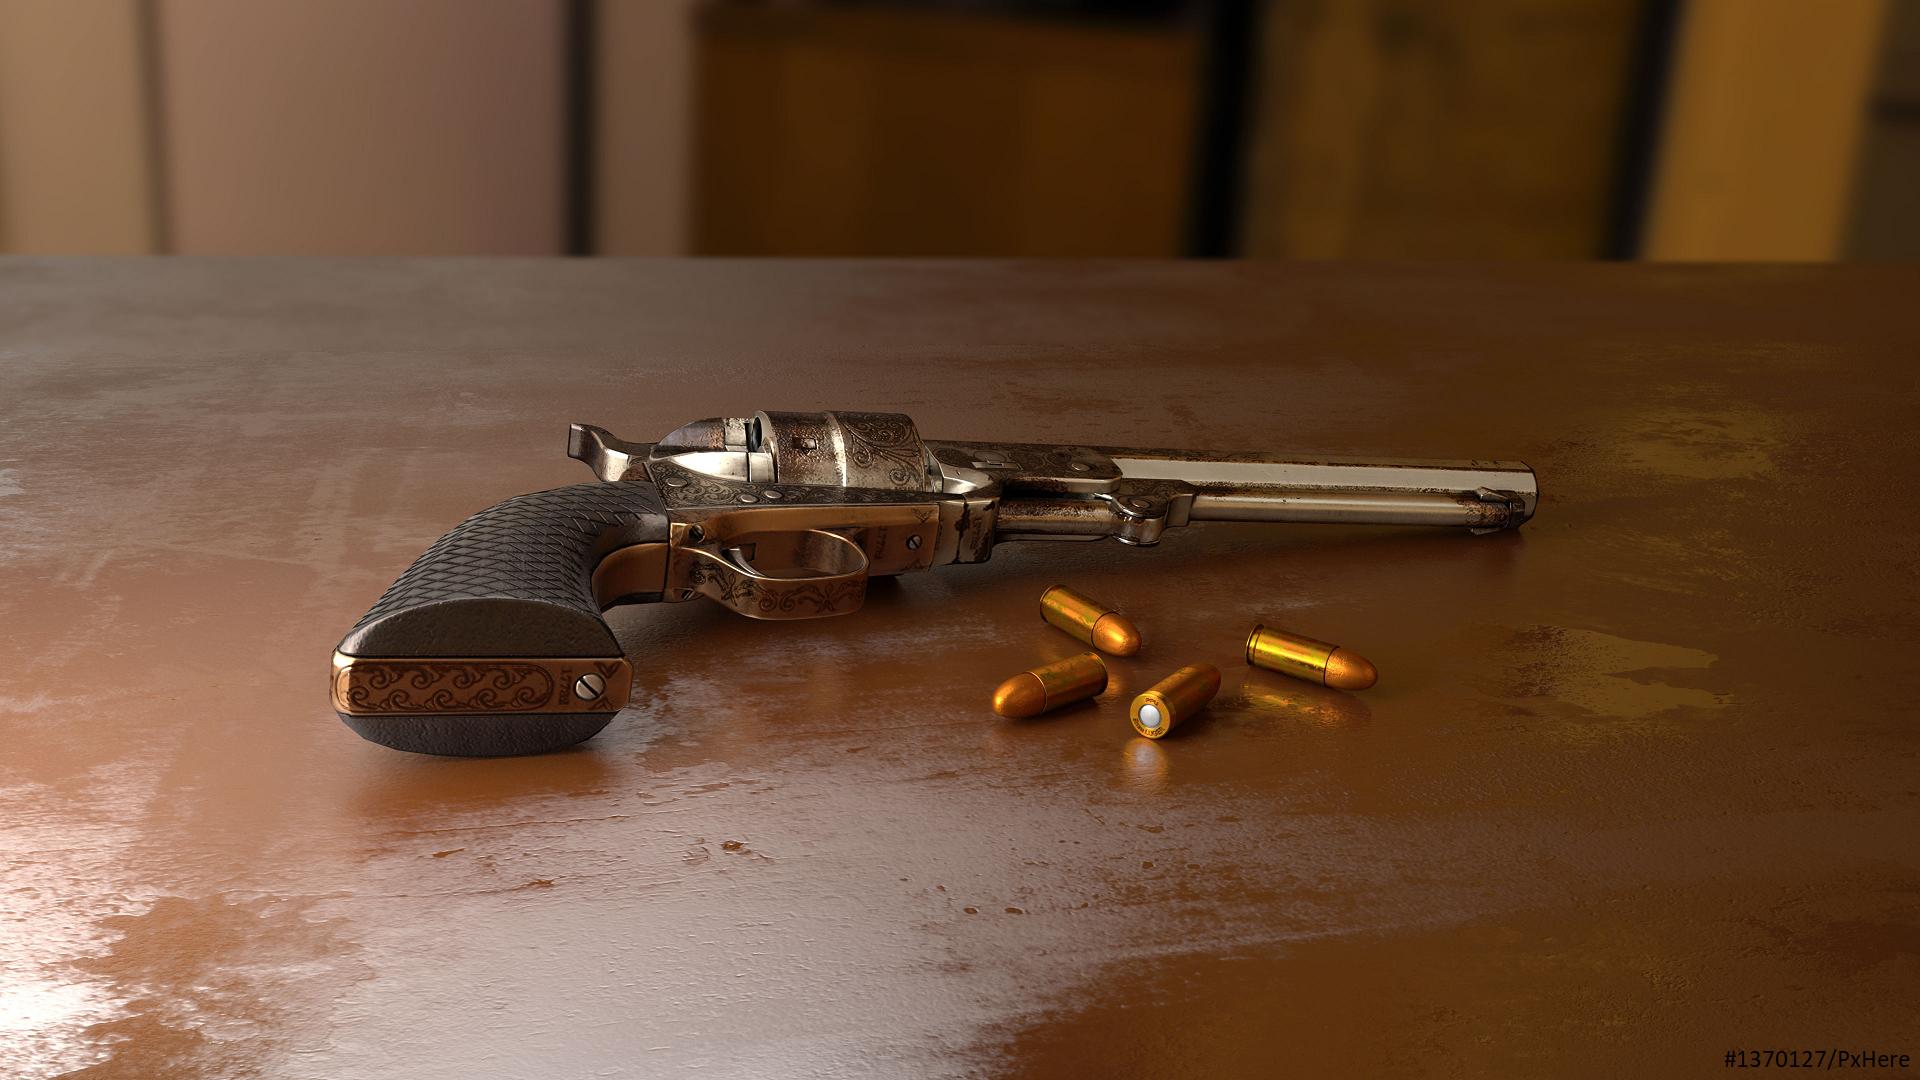 gun on table.png